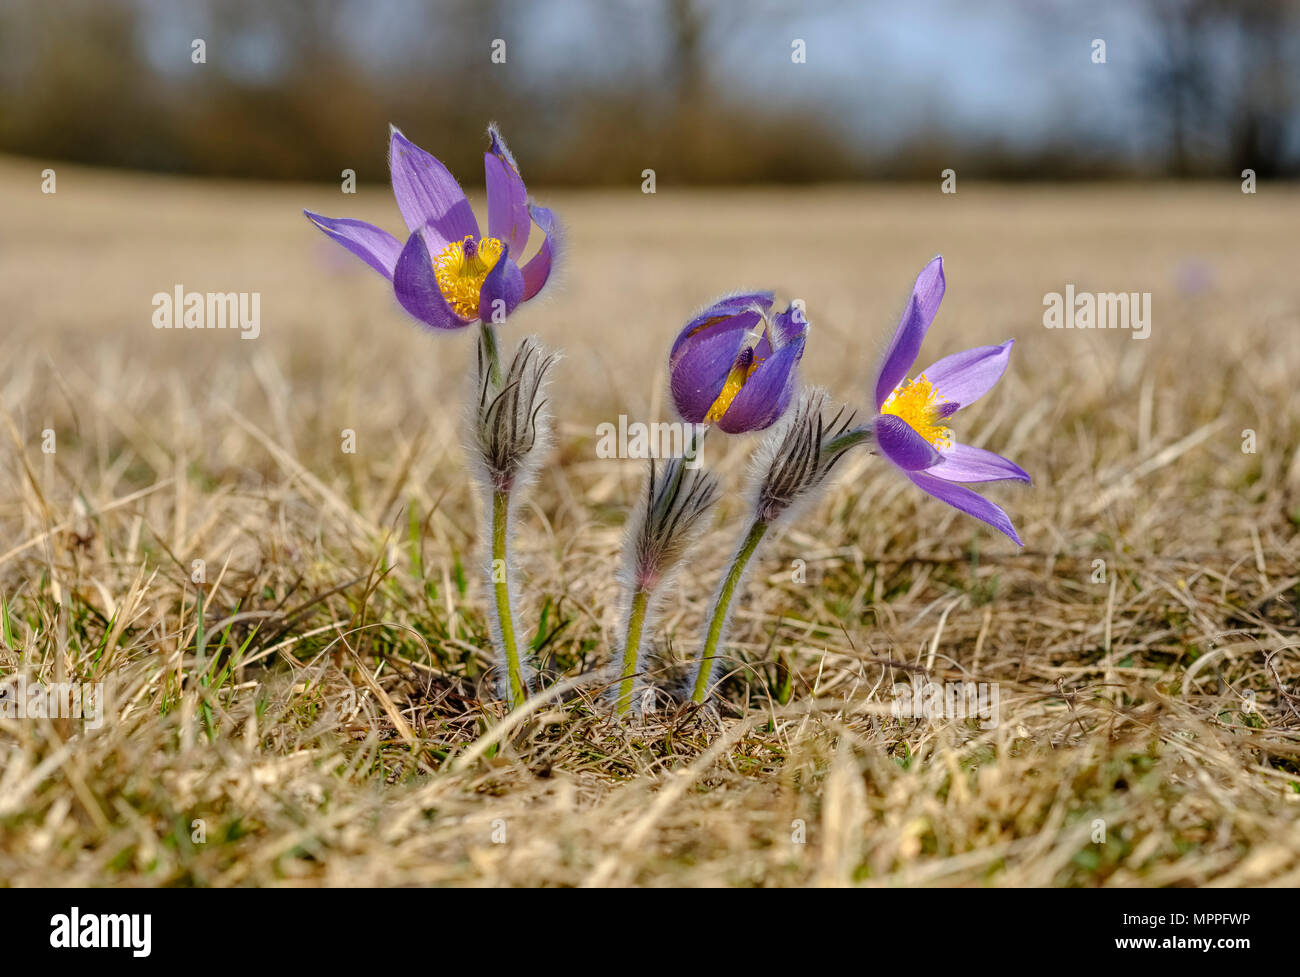 Eastern pasqueflower, Pulsatilla patens - Stock Image